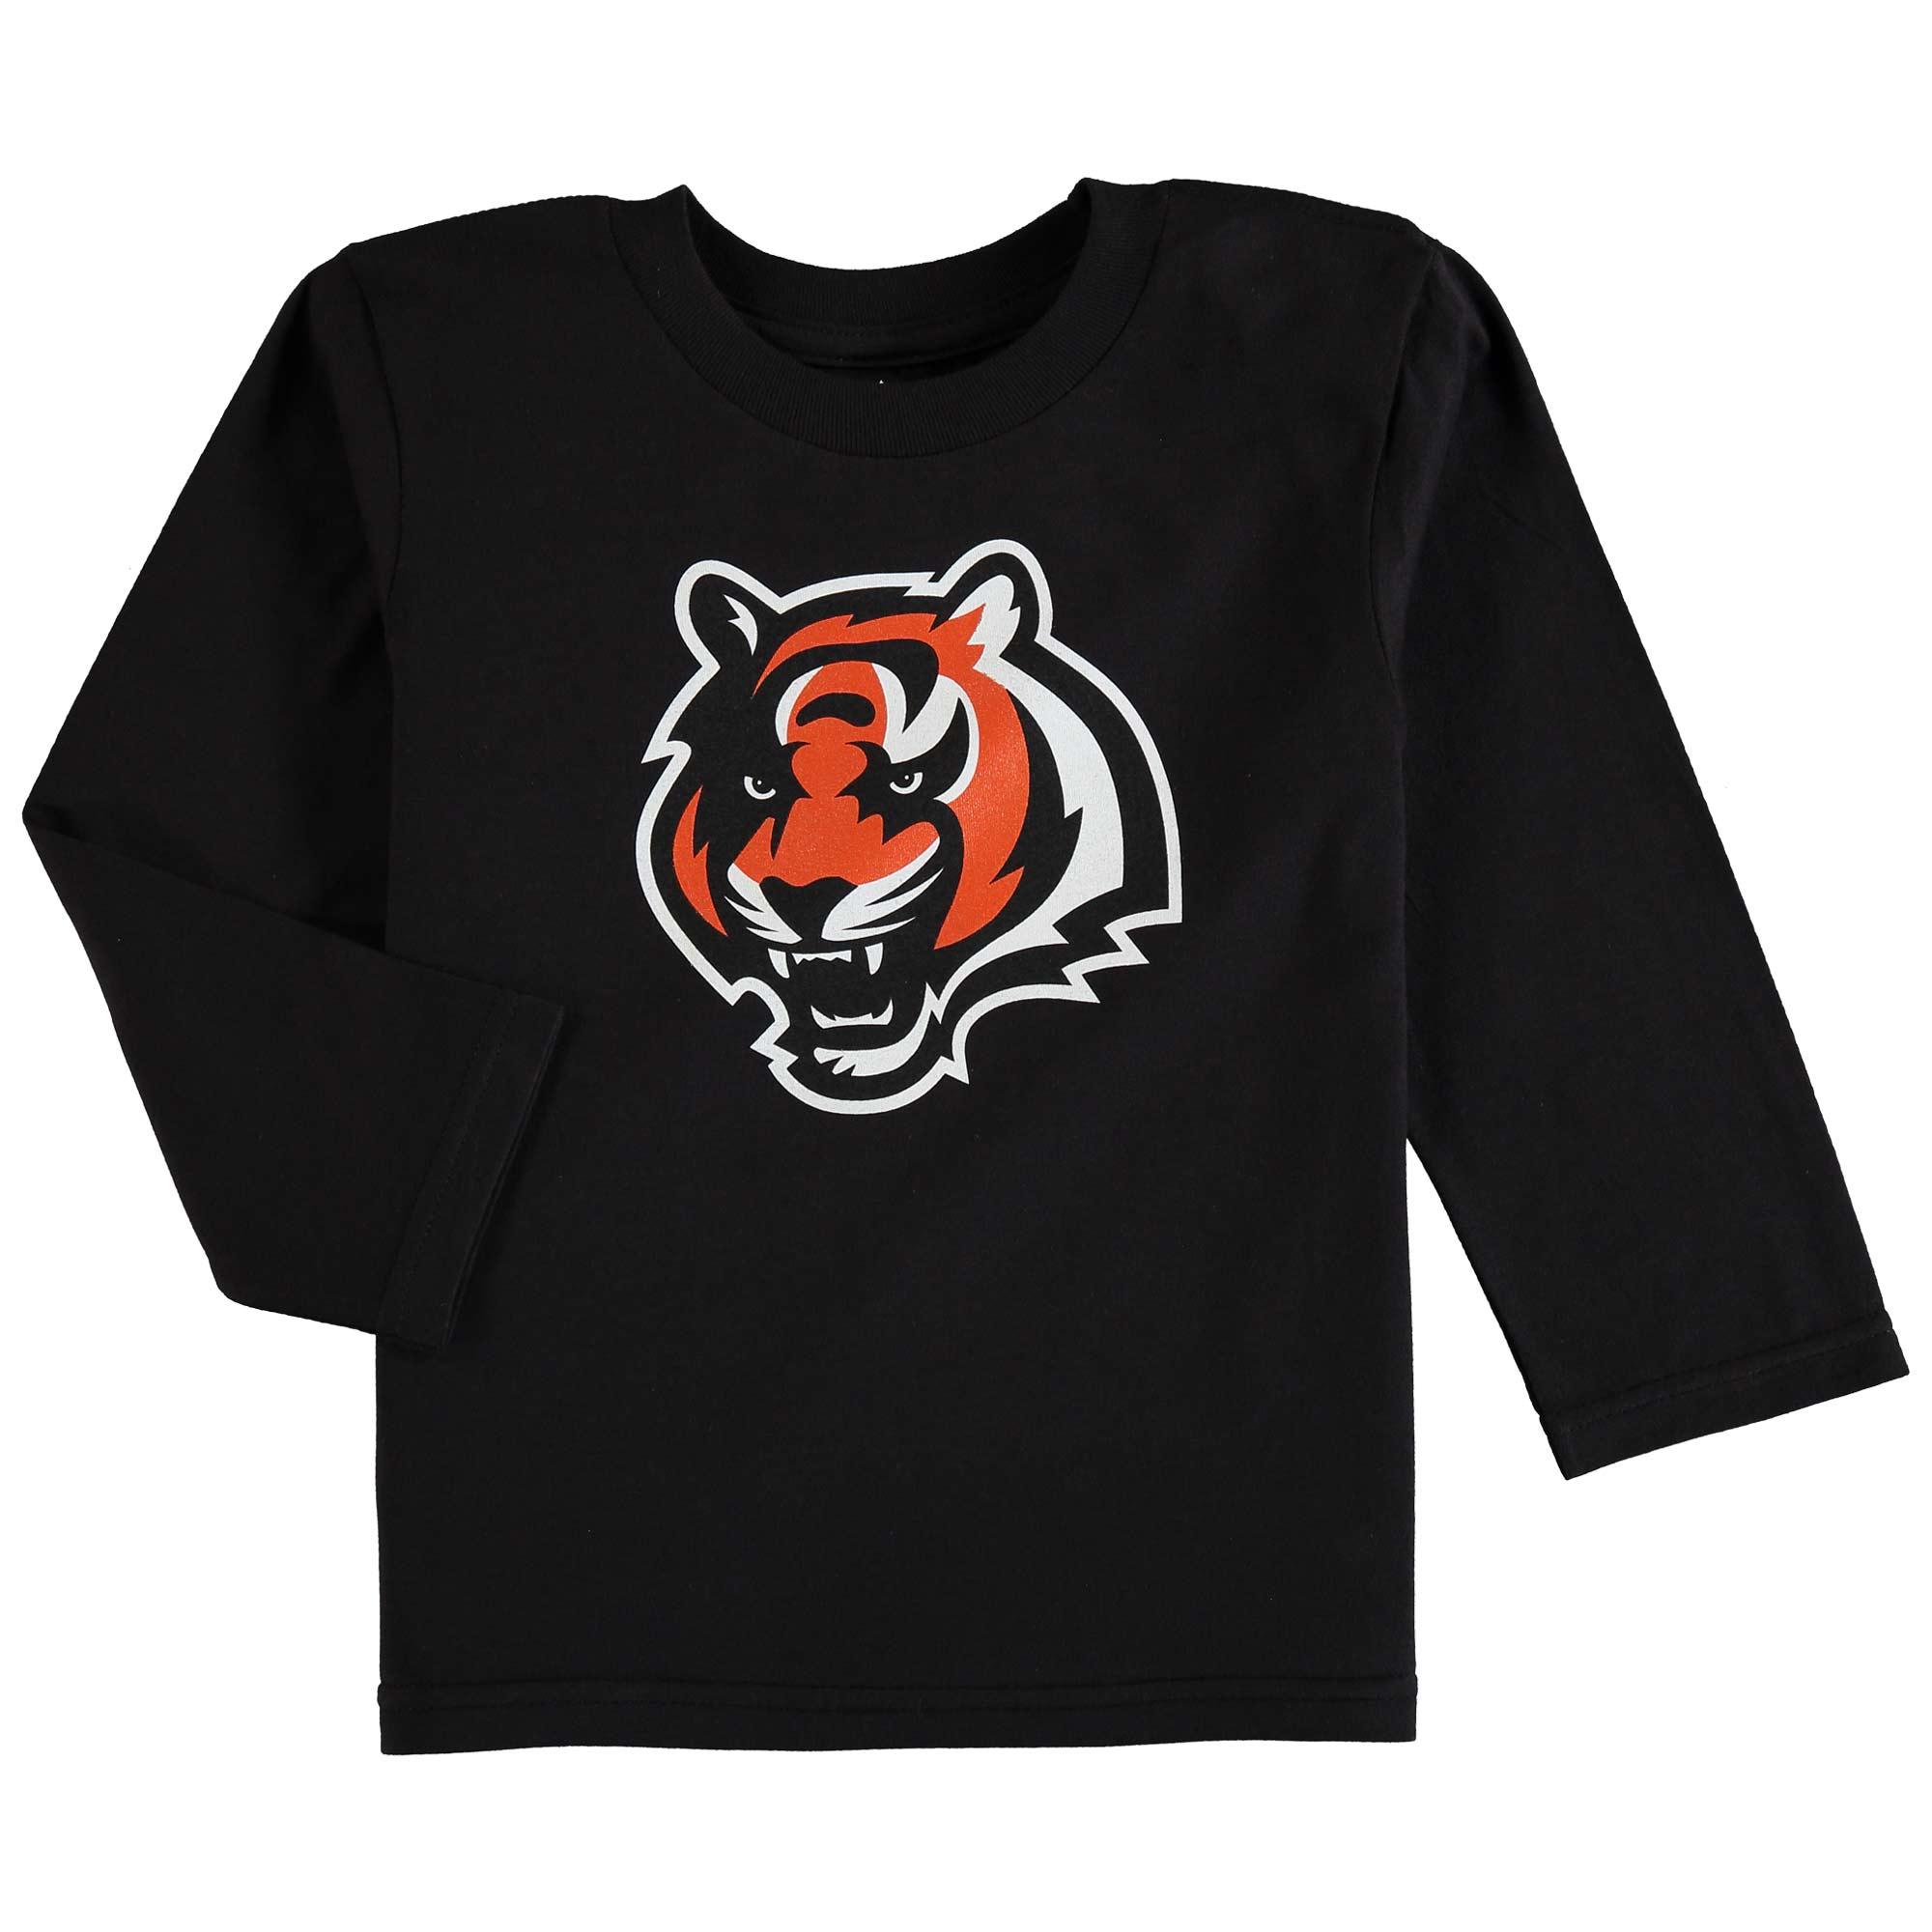 Cincinnati Bengals Preschool Team Logo Long Sleeve T-Shirt - Black